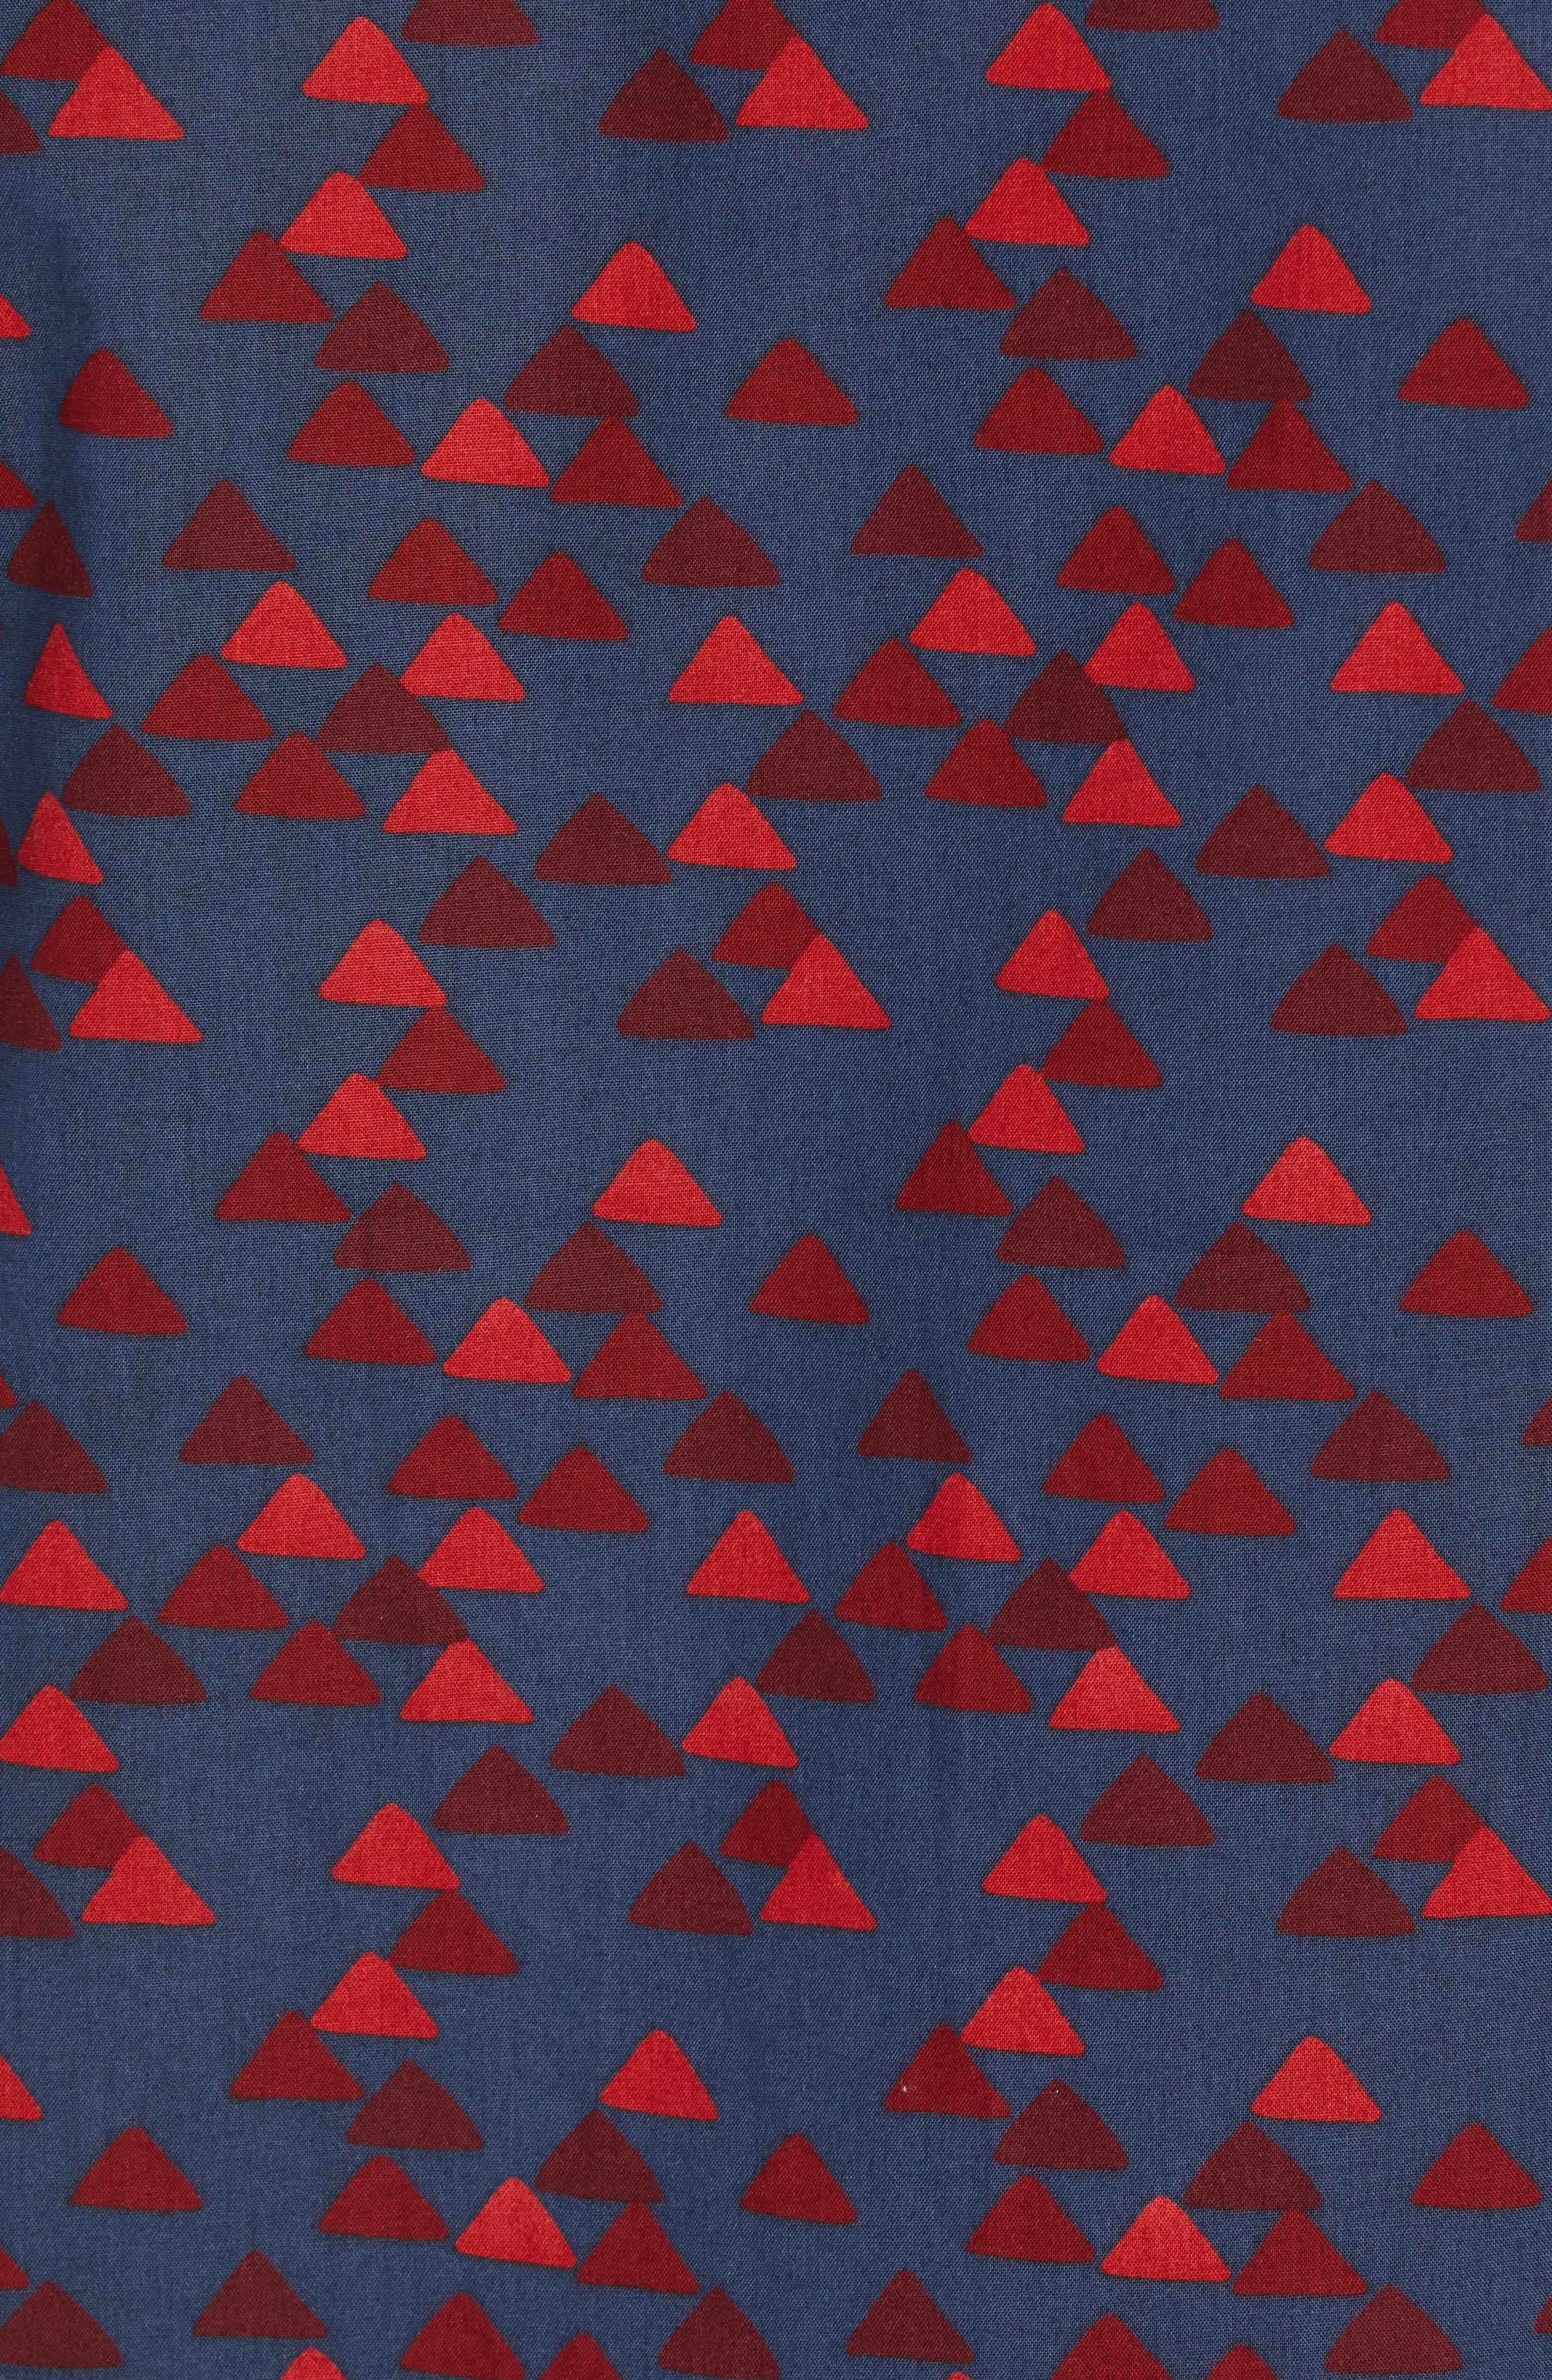 Ivy Trim Fit Print Sport Shirt,                             Alternate thumbnail 5, color,                             NAVY IRIS BURGUNDY TRIANGLES